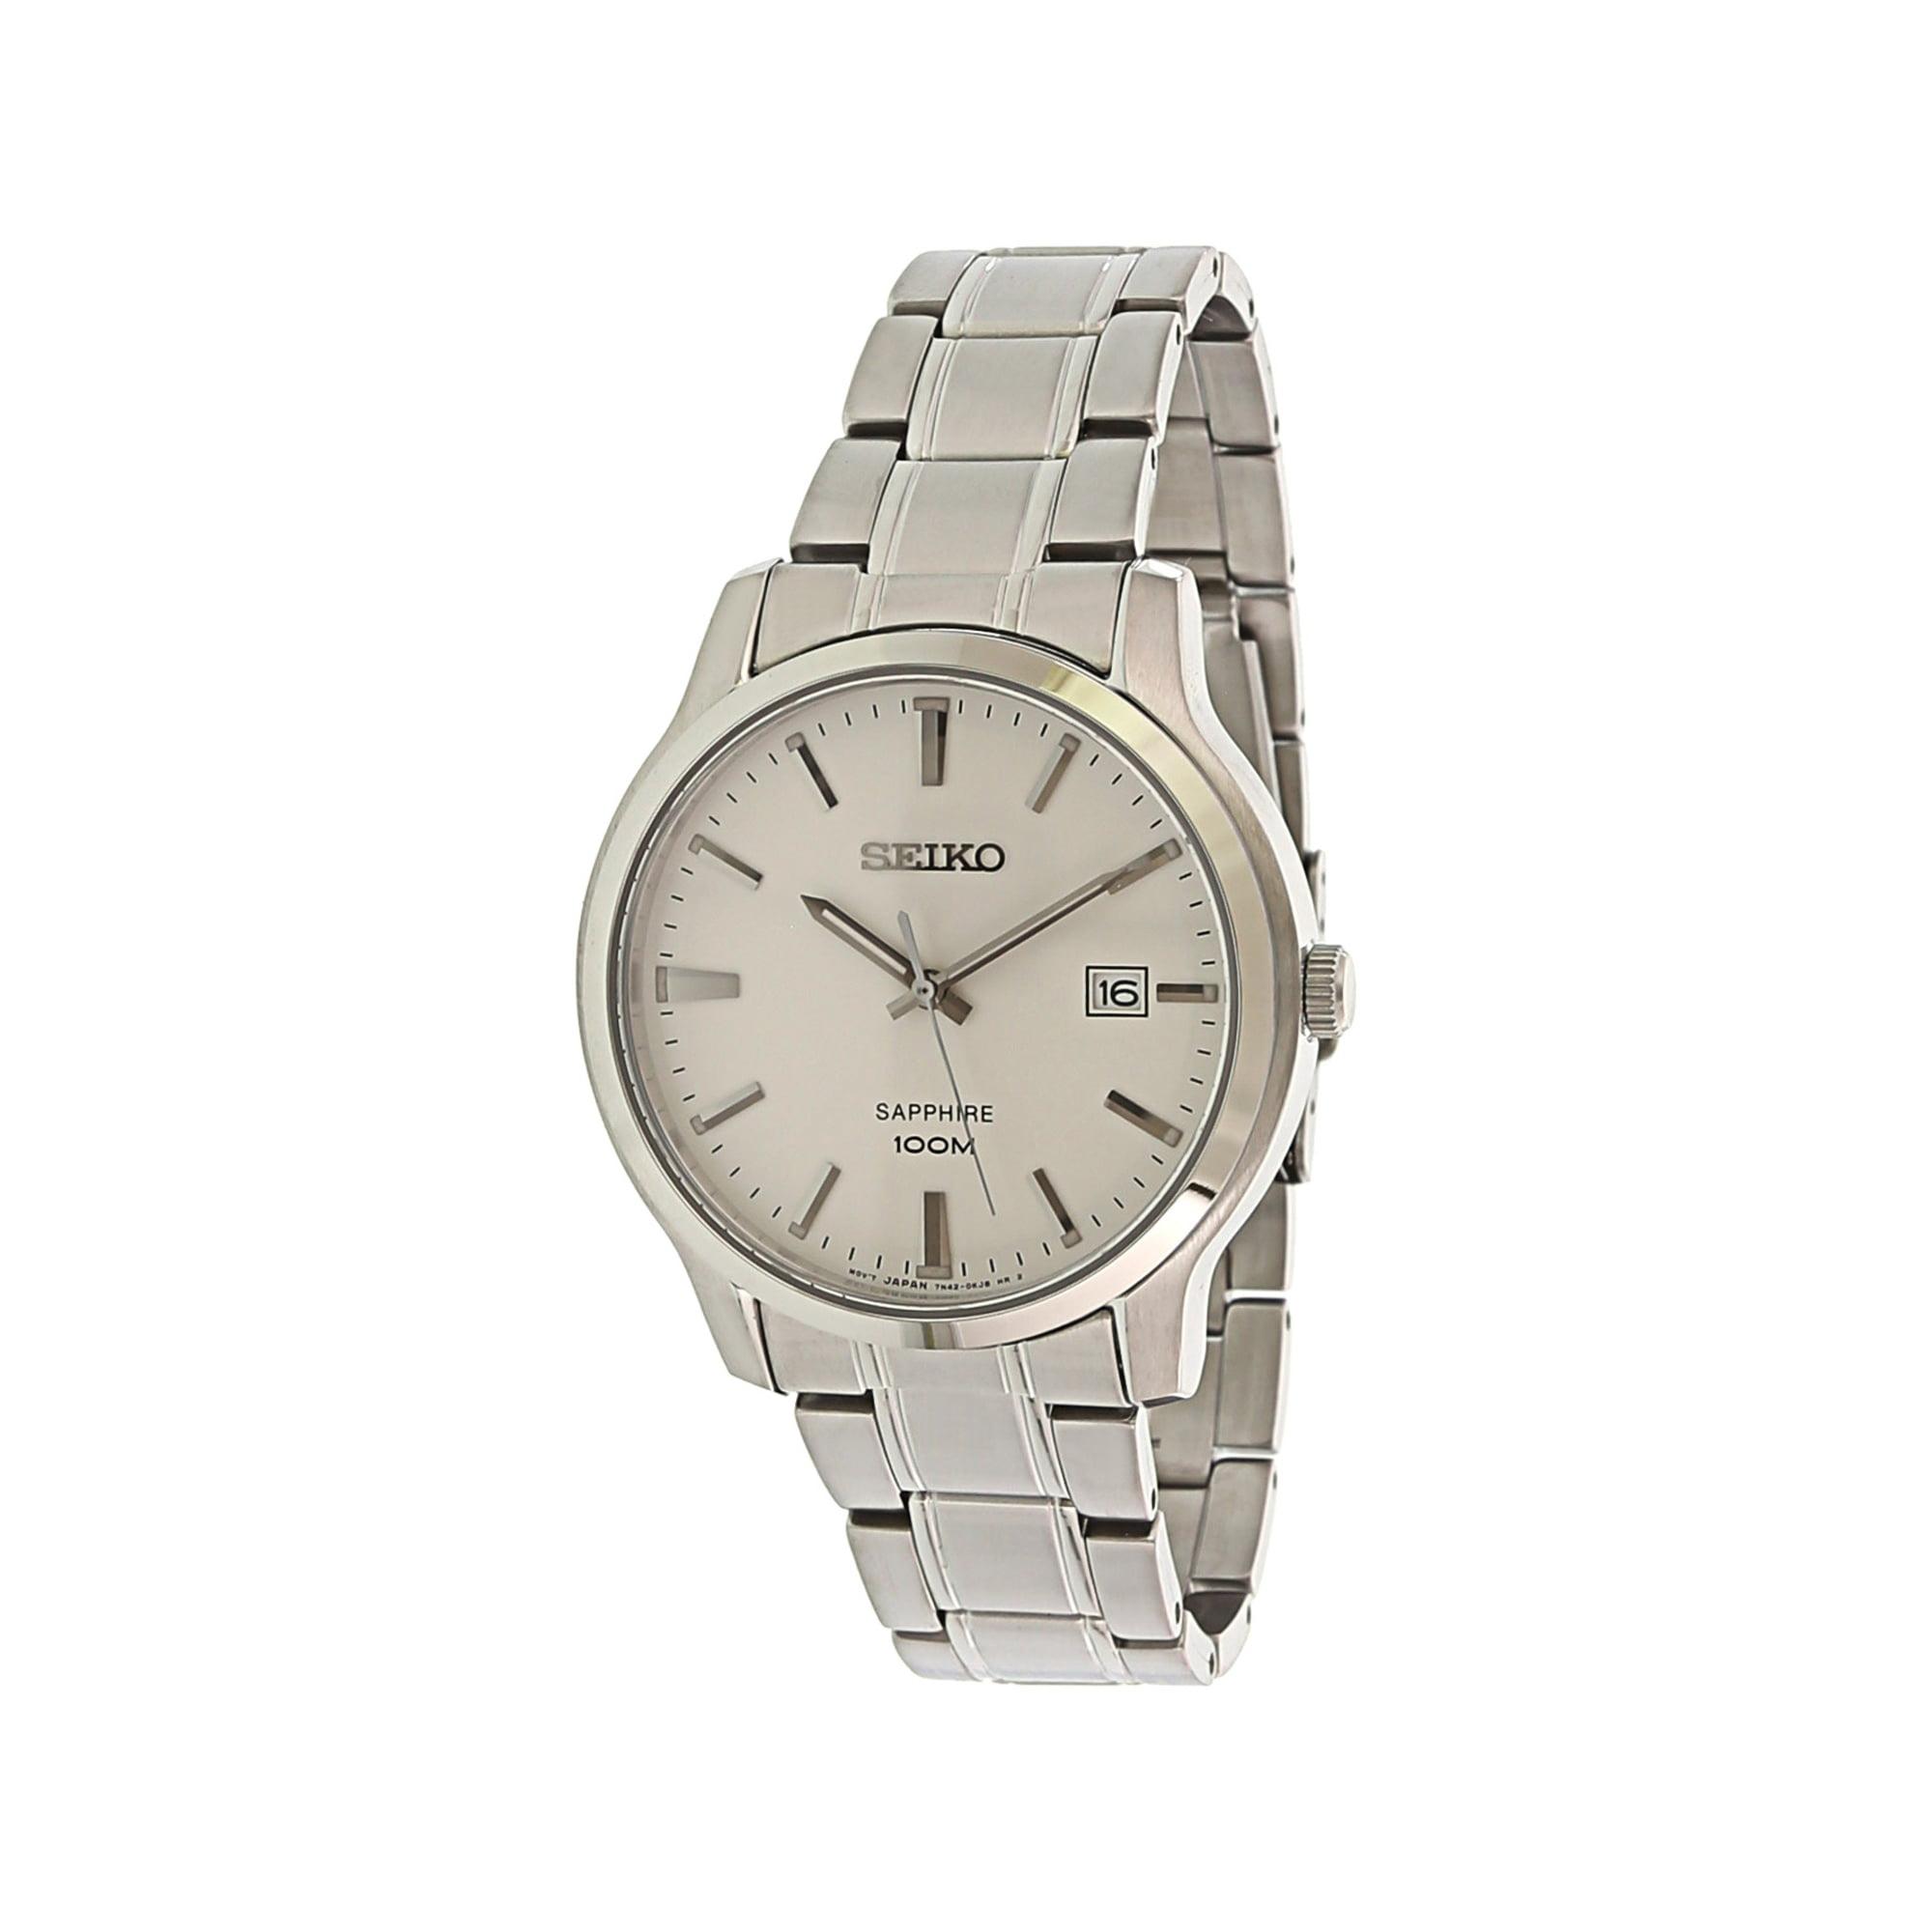 78a3c8cb327 Seiko Men's Neo Classic SGEH39 Silver Stainless-Steel Japanese Quartz  Fashion Watch | Walmart Canada